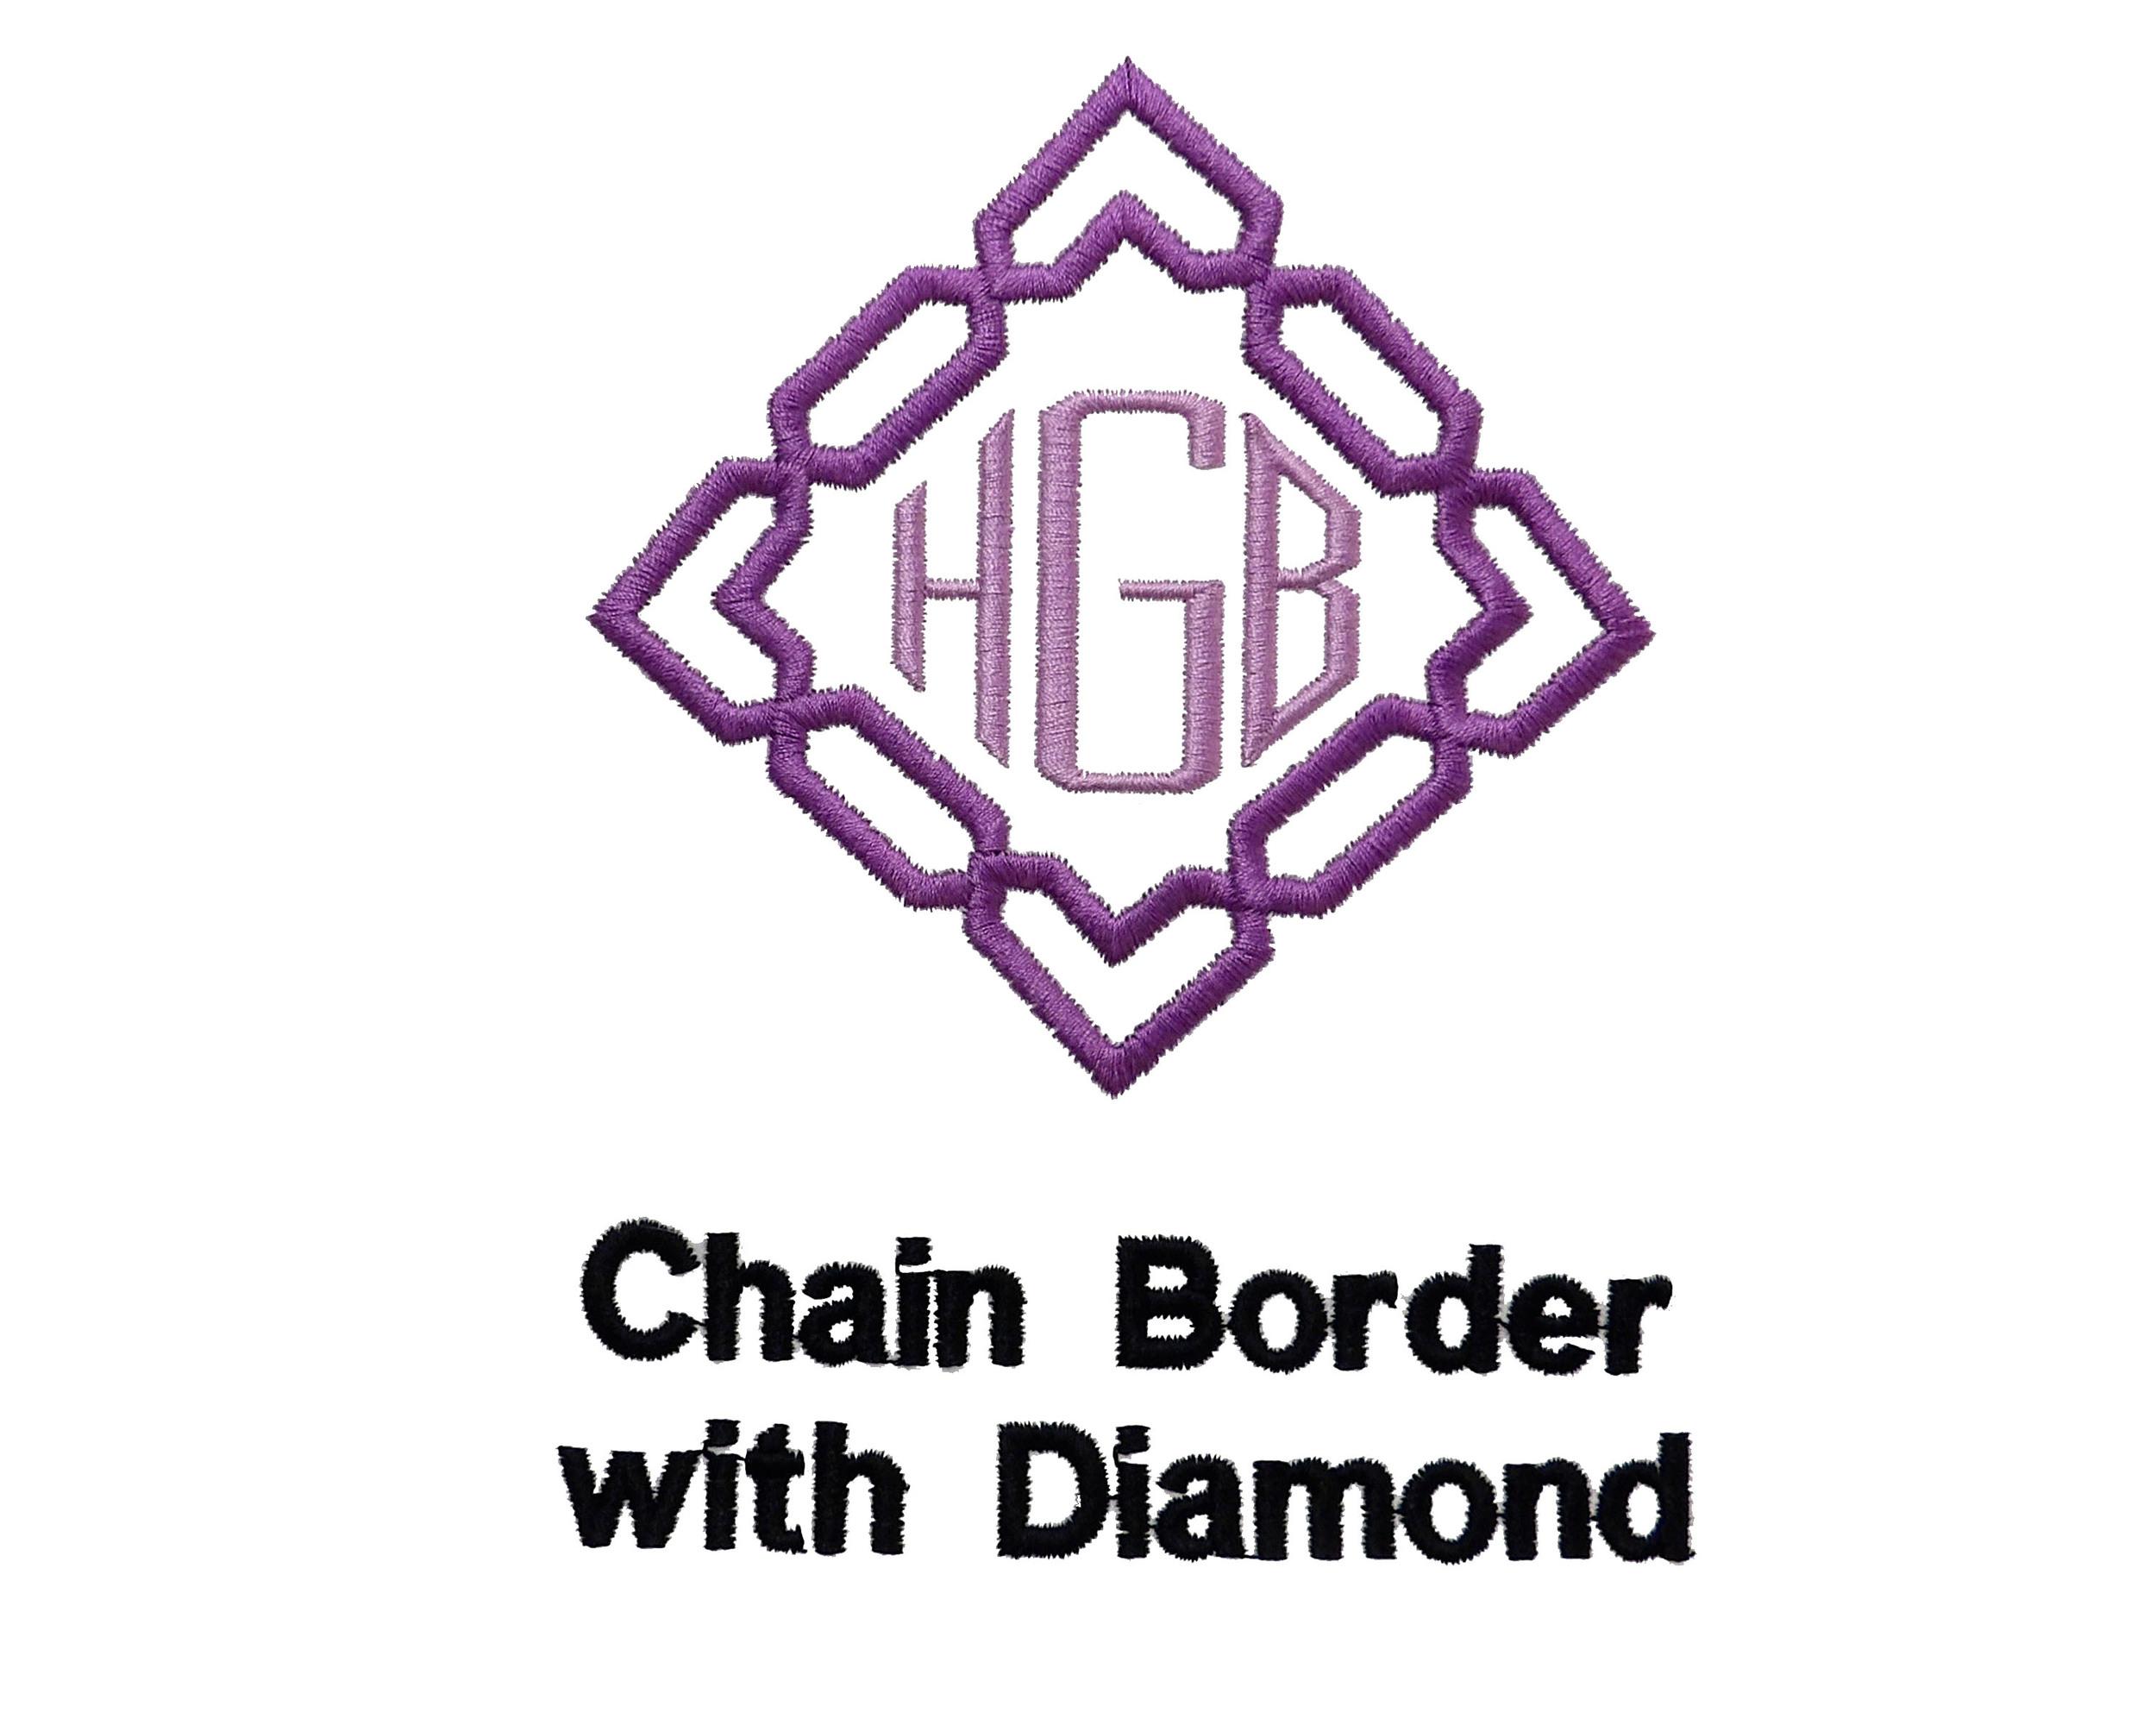 Chain Border With Diamond.jpg